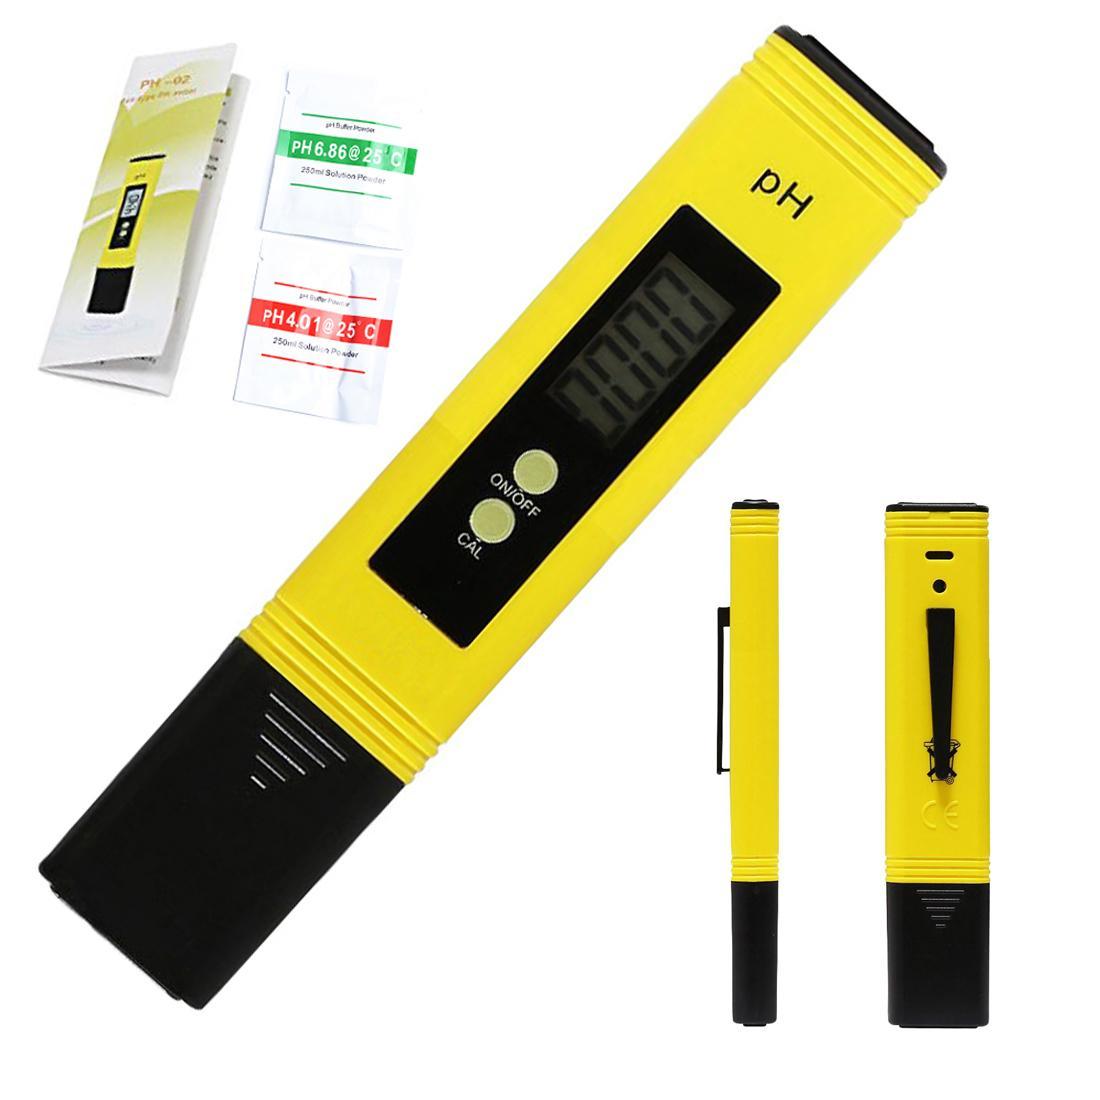 Digital LCD PH Meter Pen of Tester Accuracy 0.1 Aquarium Pool Water Wine Urine Automatic Calibration